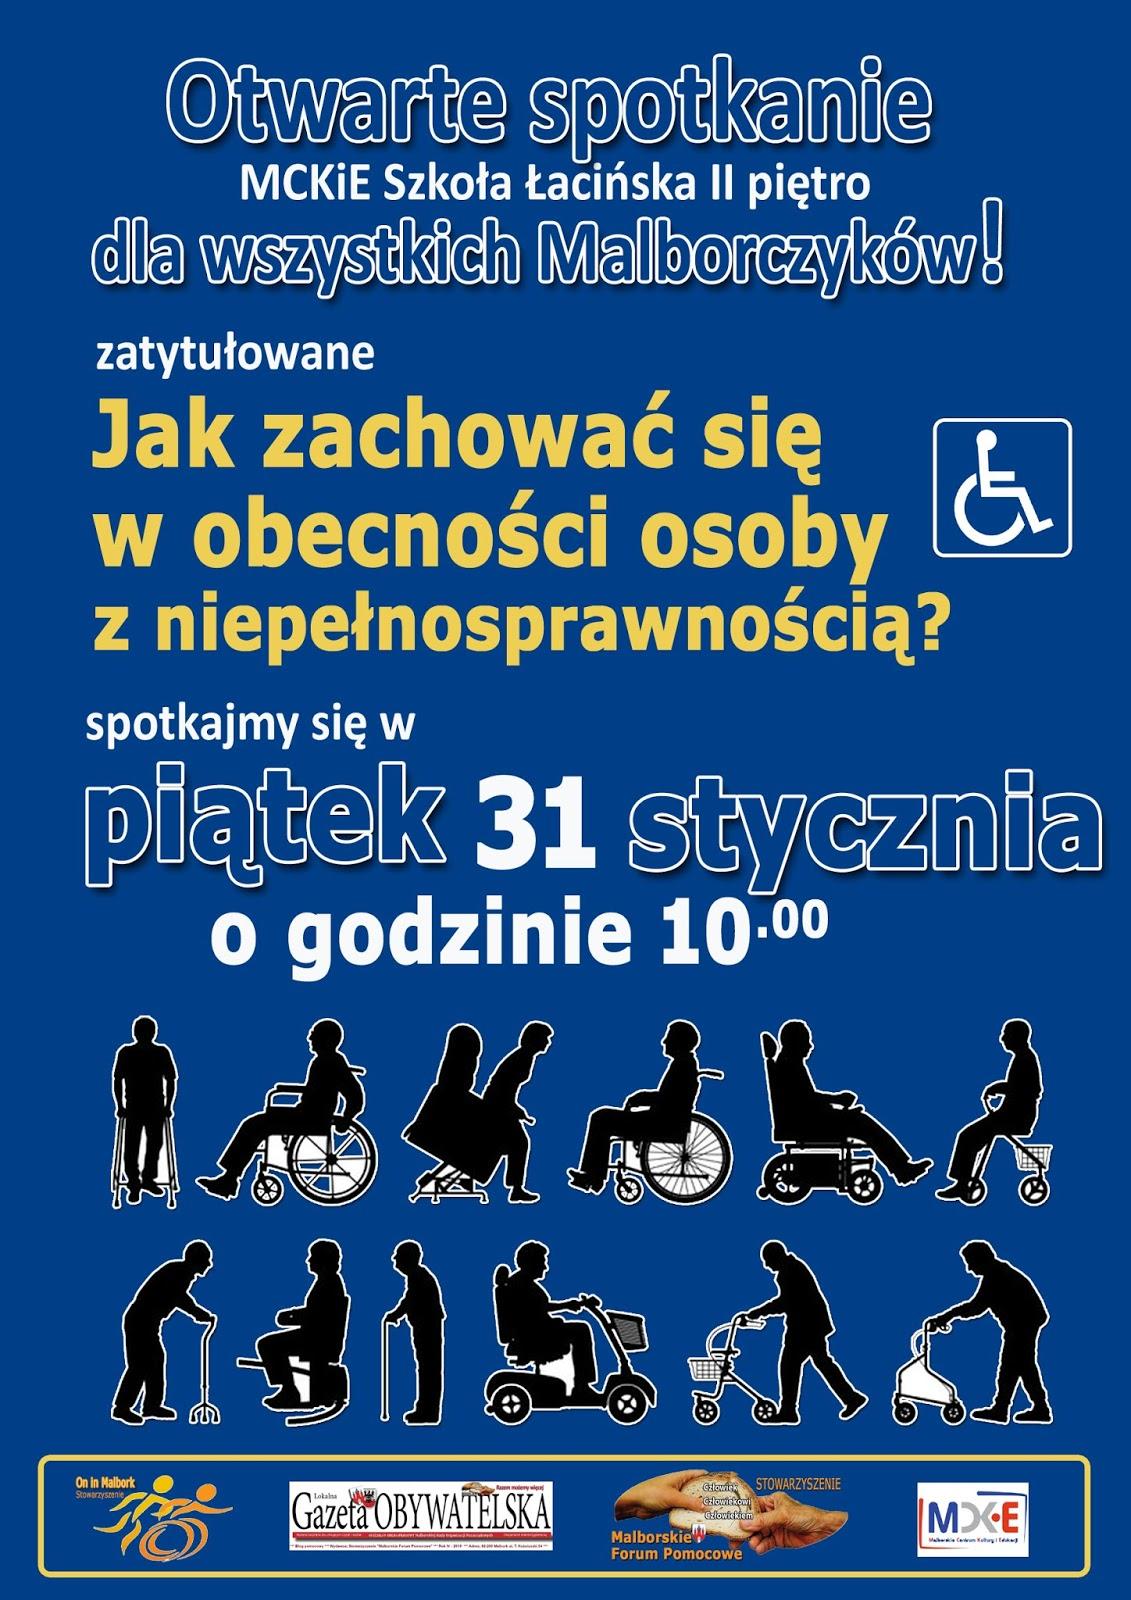 http://m.82-200.pl/2020/01/orig/plakat-gotowy-5427.jpg